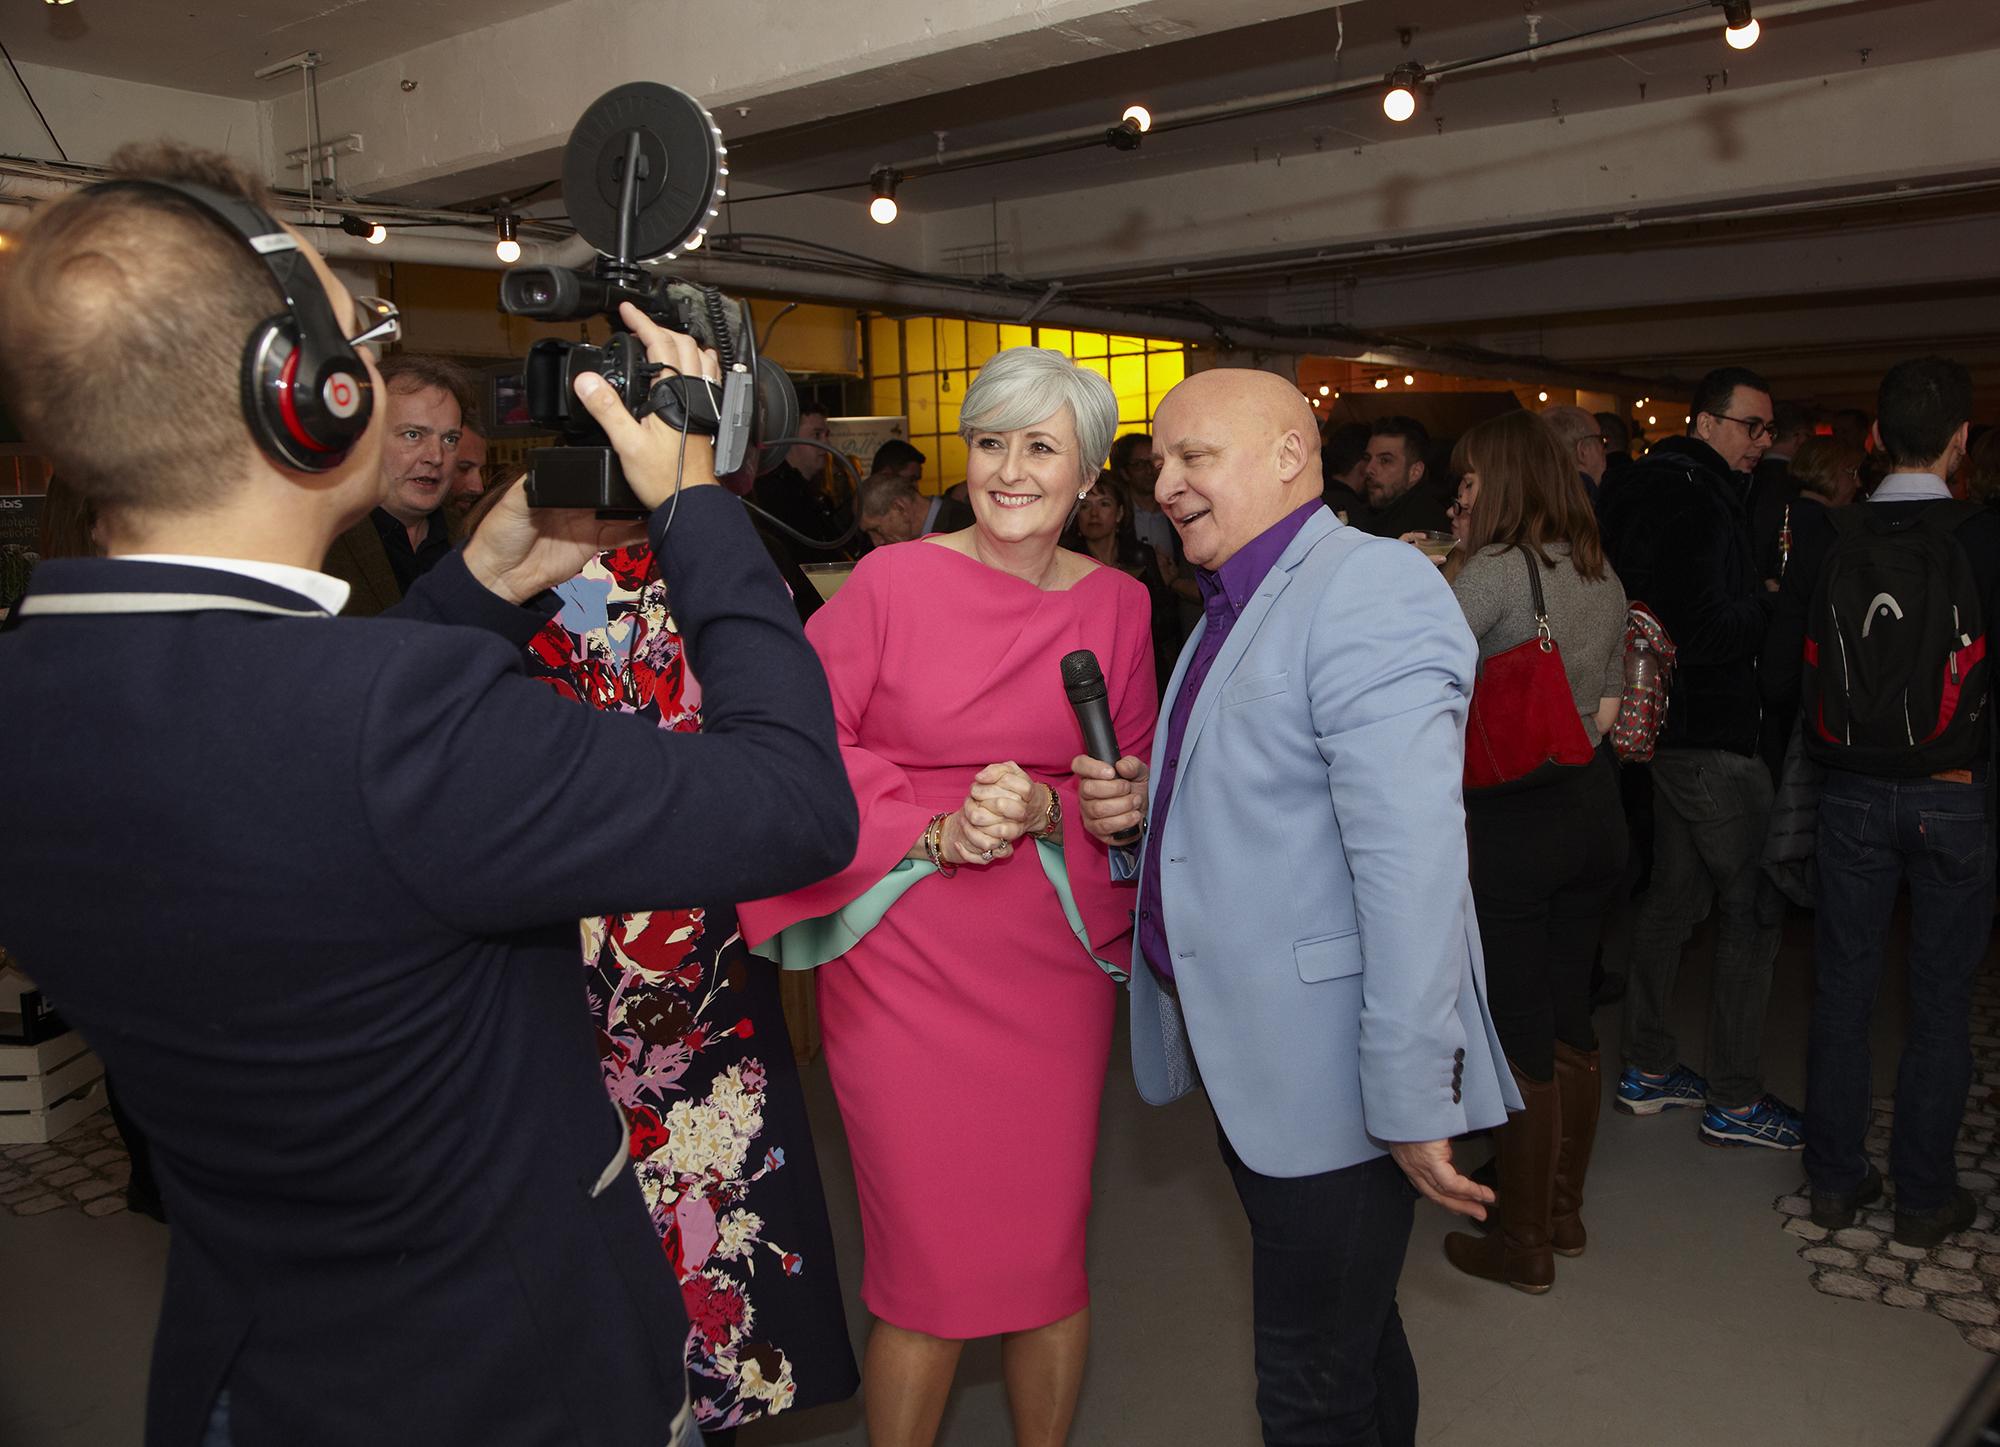 Pesto Pioneers, Sacla' UK, Celebrate 25 years with friends in Soho, Aldo Zilli featured